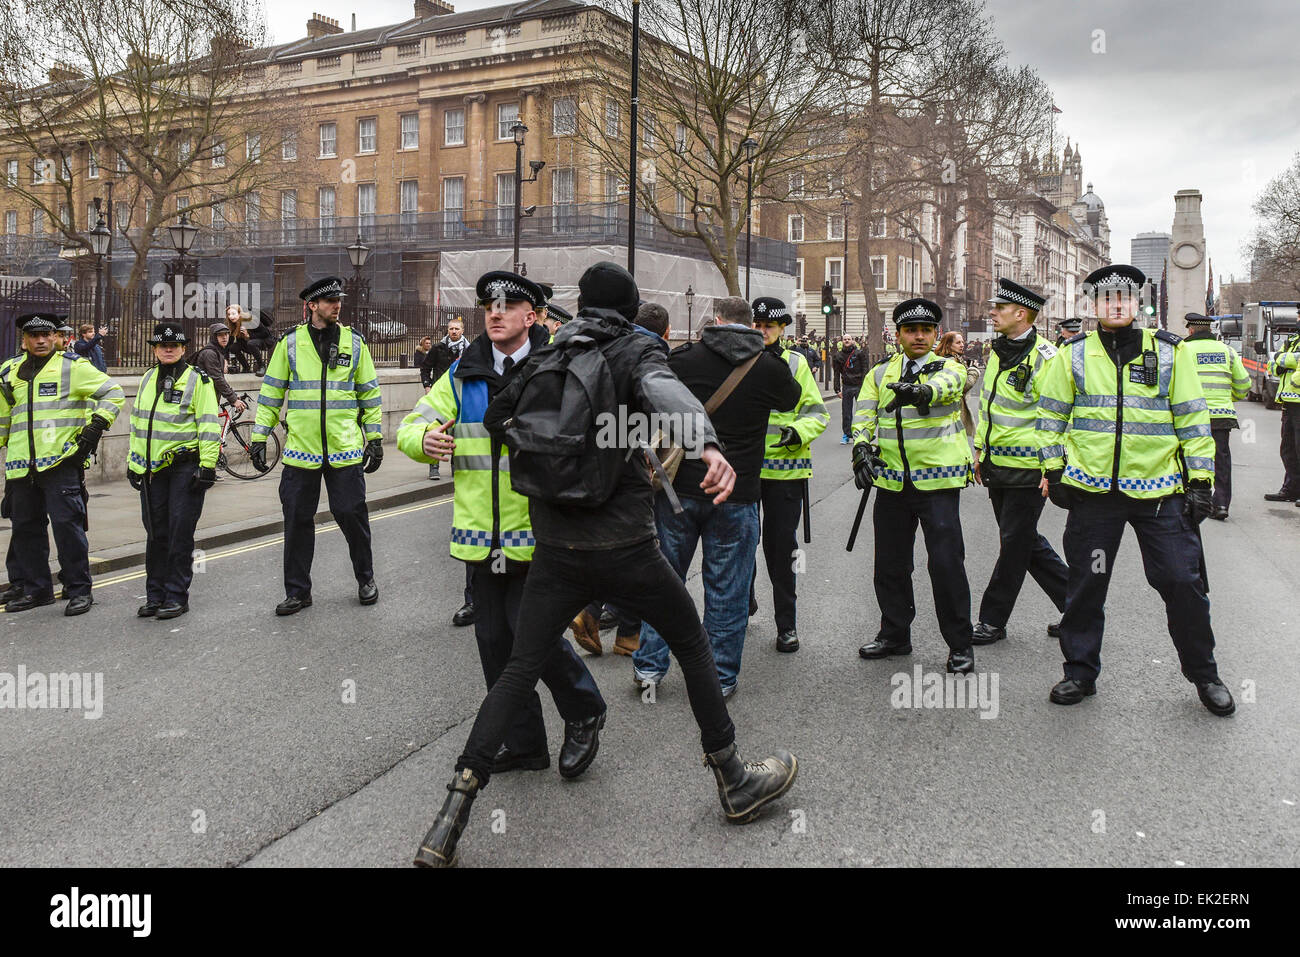 Antifaschisten demonstrieren gegen Pergida in Whitehall. Stockbild